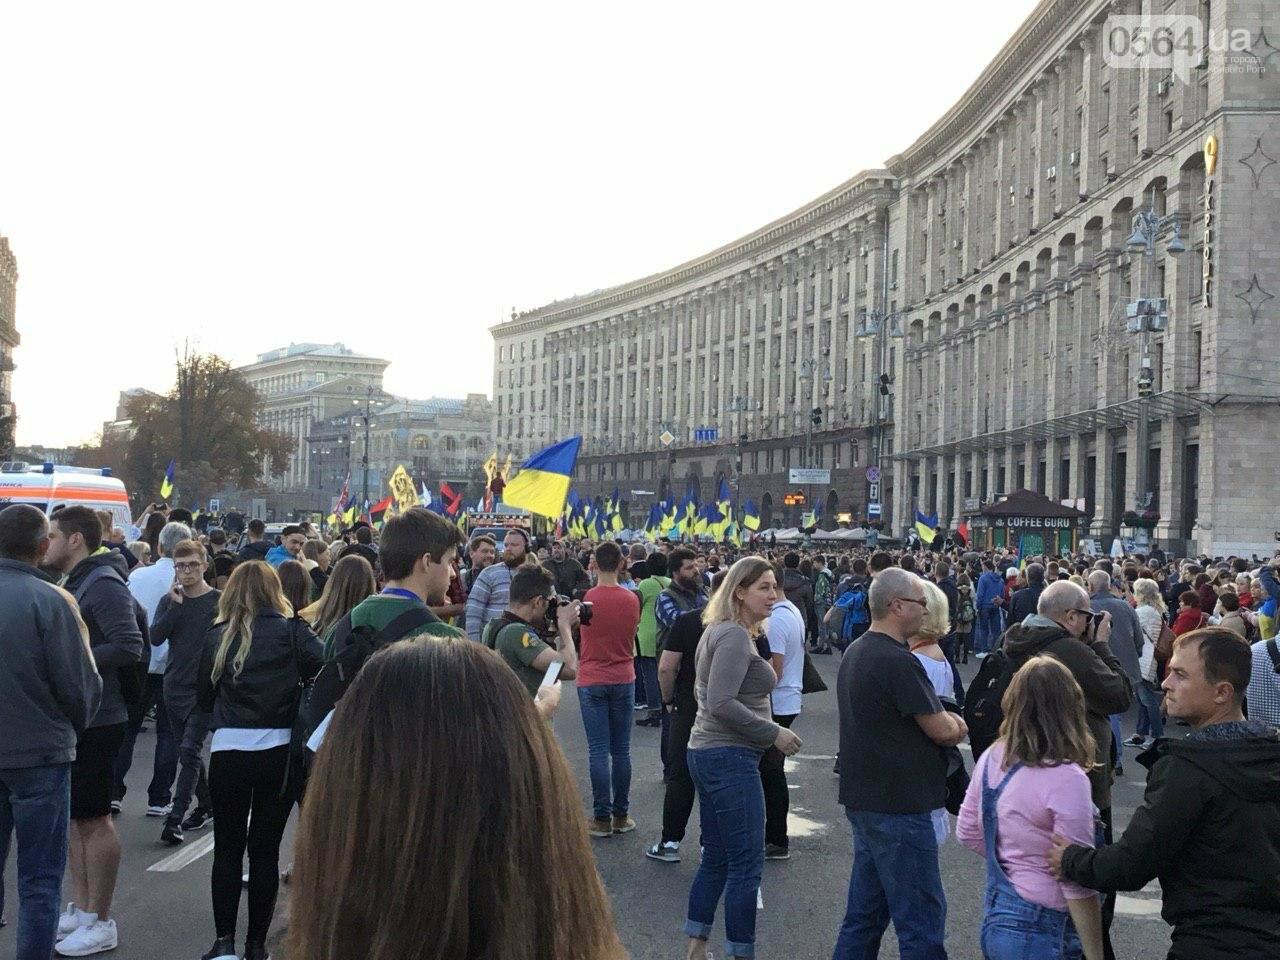 Криворожане поддержали Марш сопротивления капитуляции в Киеве, - ФОТО, ВИДЕО, ОБНОВЛЕНО, фото-27